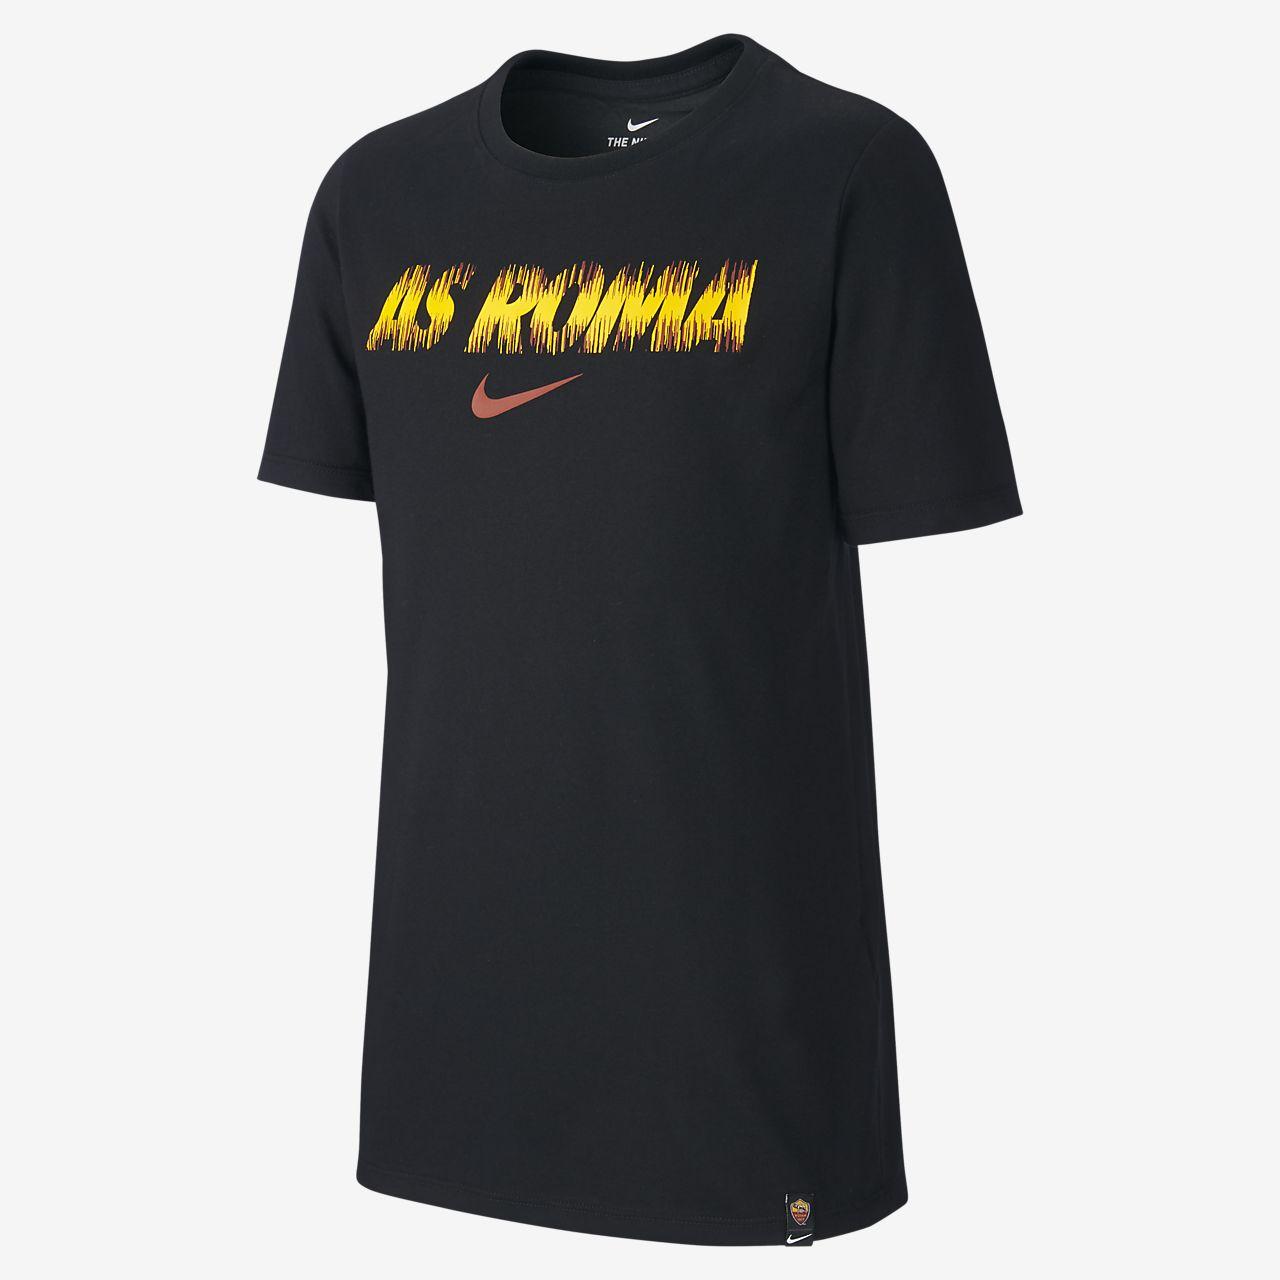 Nike Dri-FIT A.S. Roma Genç Çocuk Futbol Tişörtü